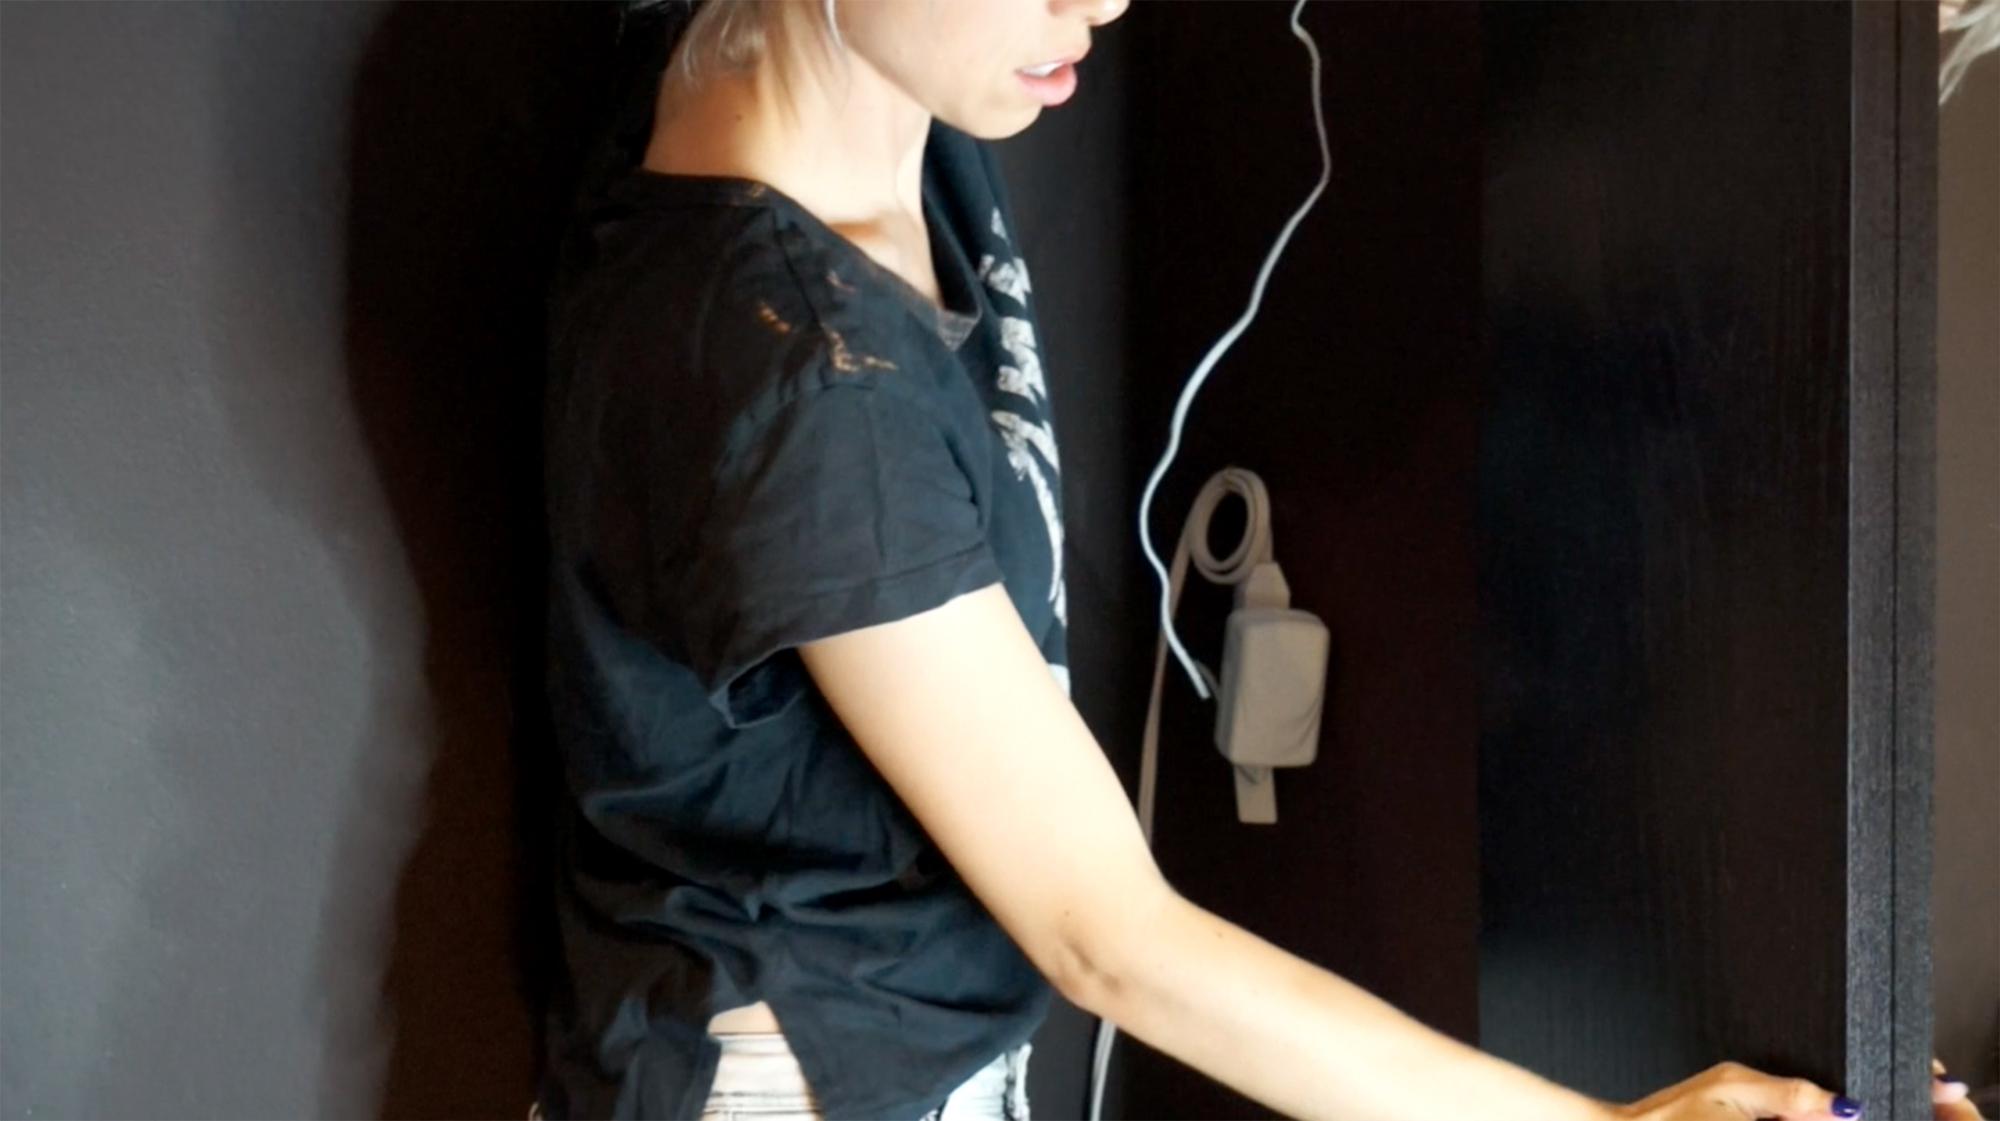 Hiding extension cord